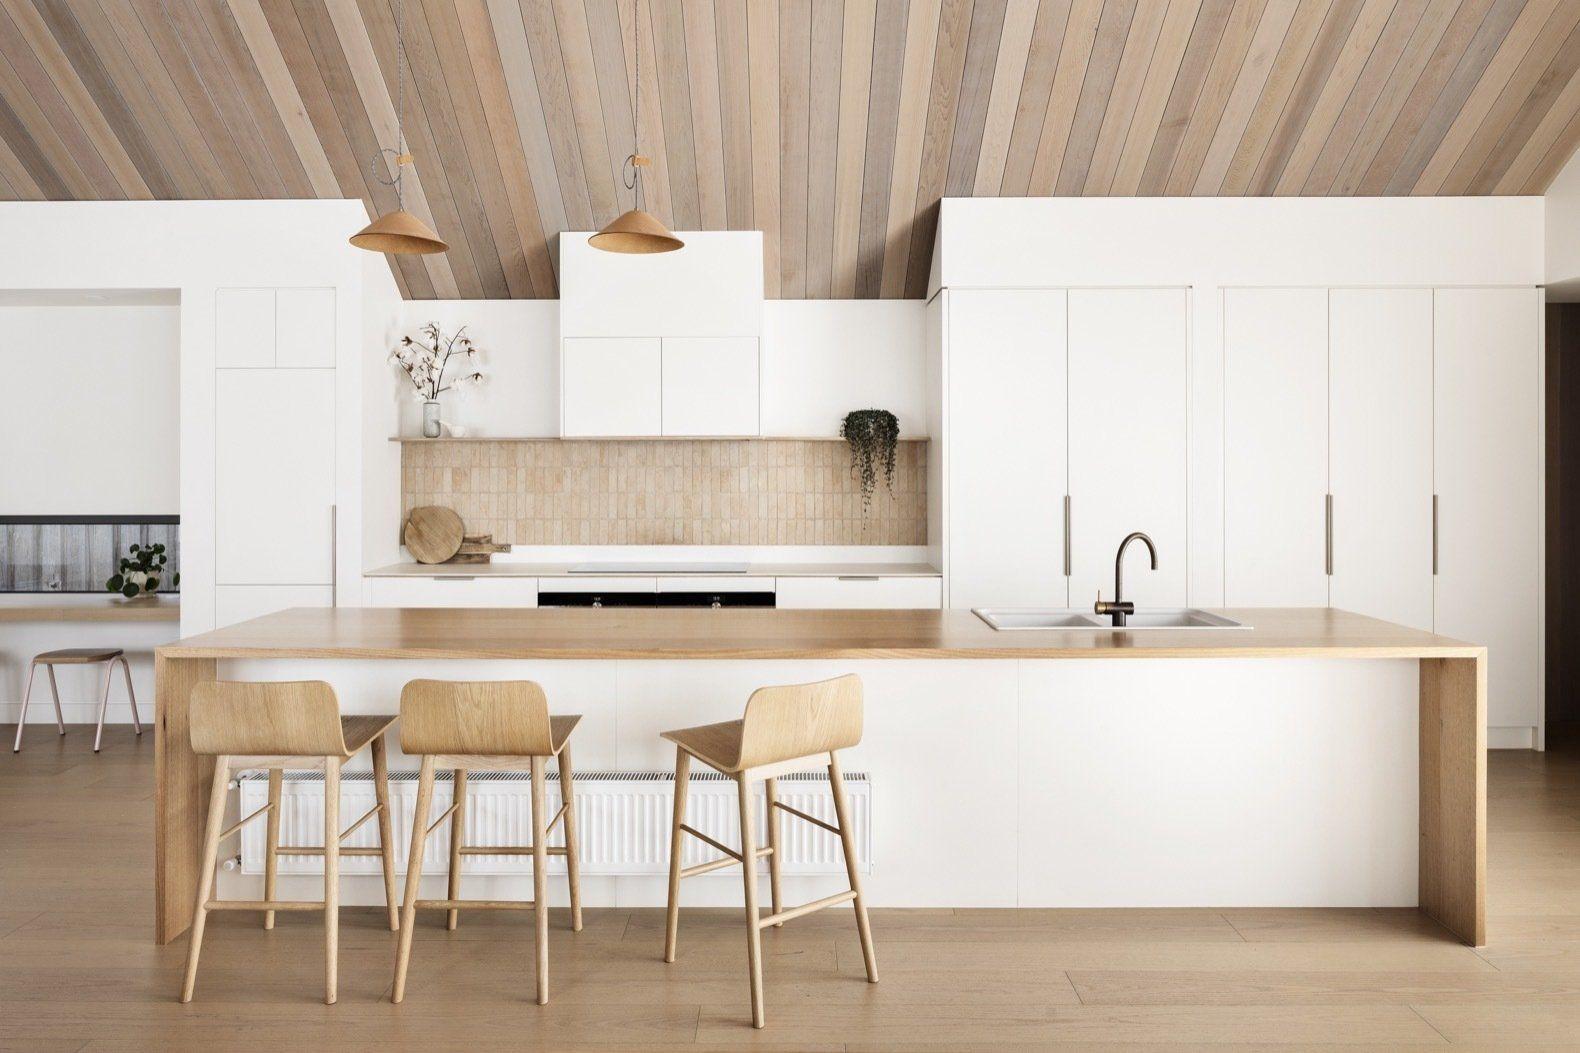 Australia's best architectural kitchens celebrated in 2020